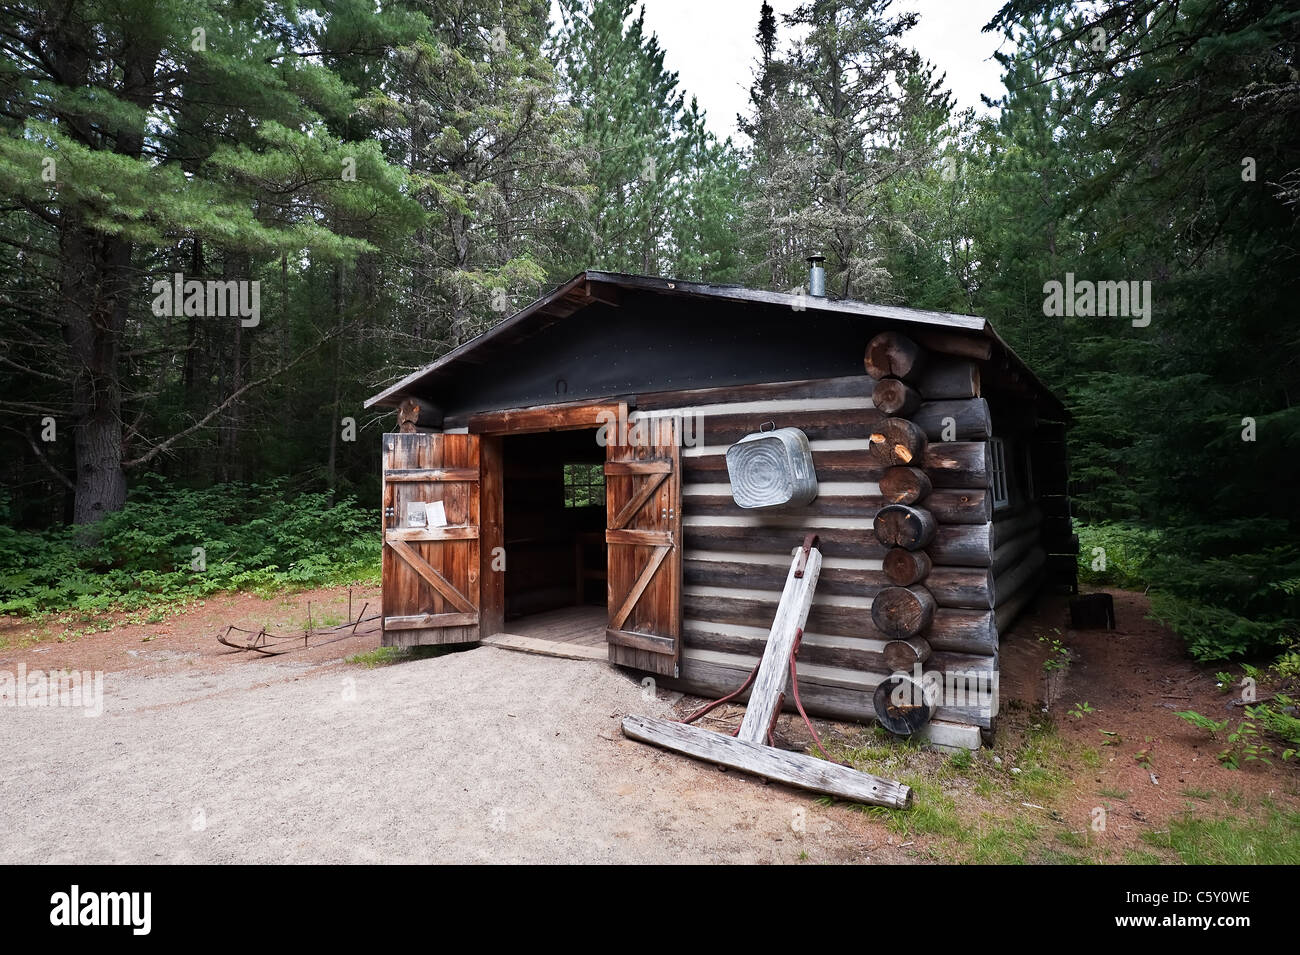 Old log cabin in Algonquin park, Ontario Canada - Stock Image